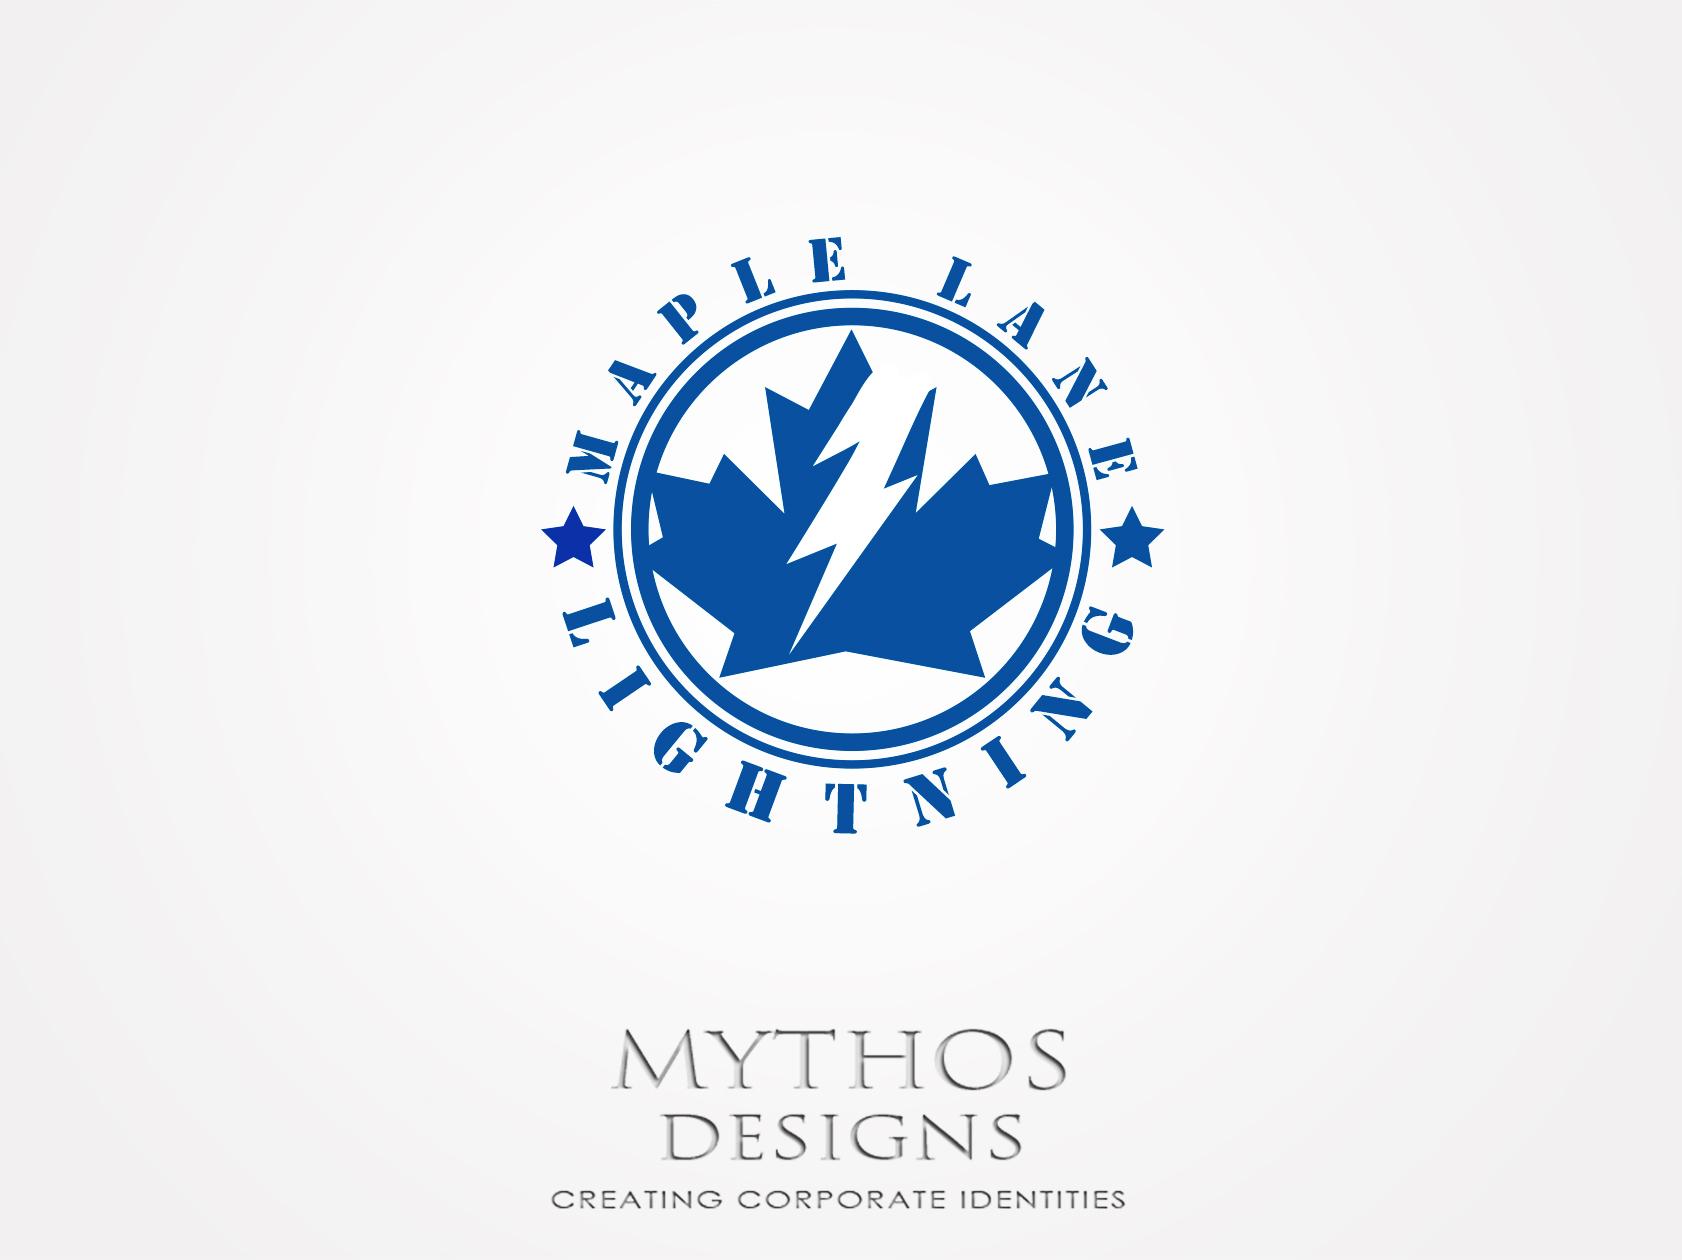 Logo Design by Mythos Designs - Entry No. 87 in the Logo Design Contest Maple Lane Logo Design.